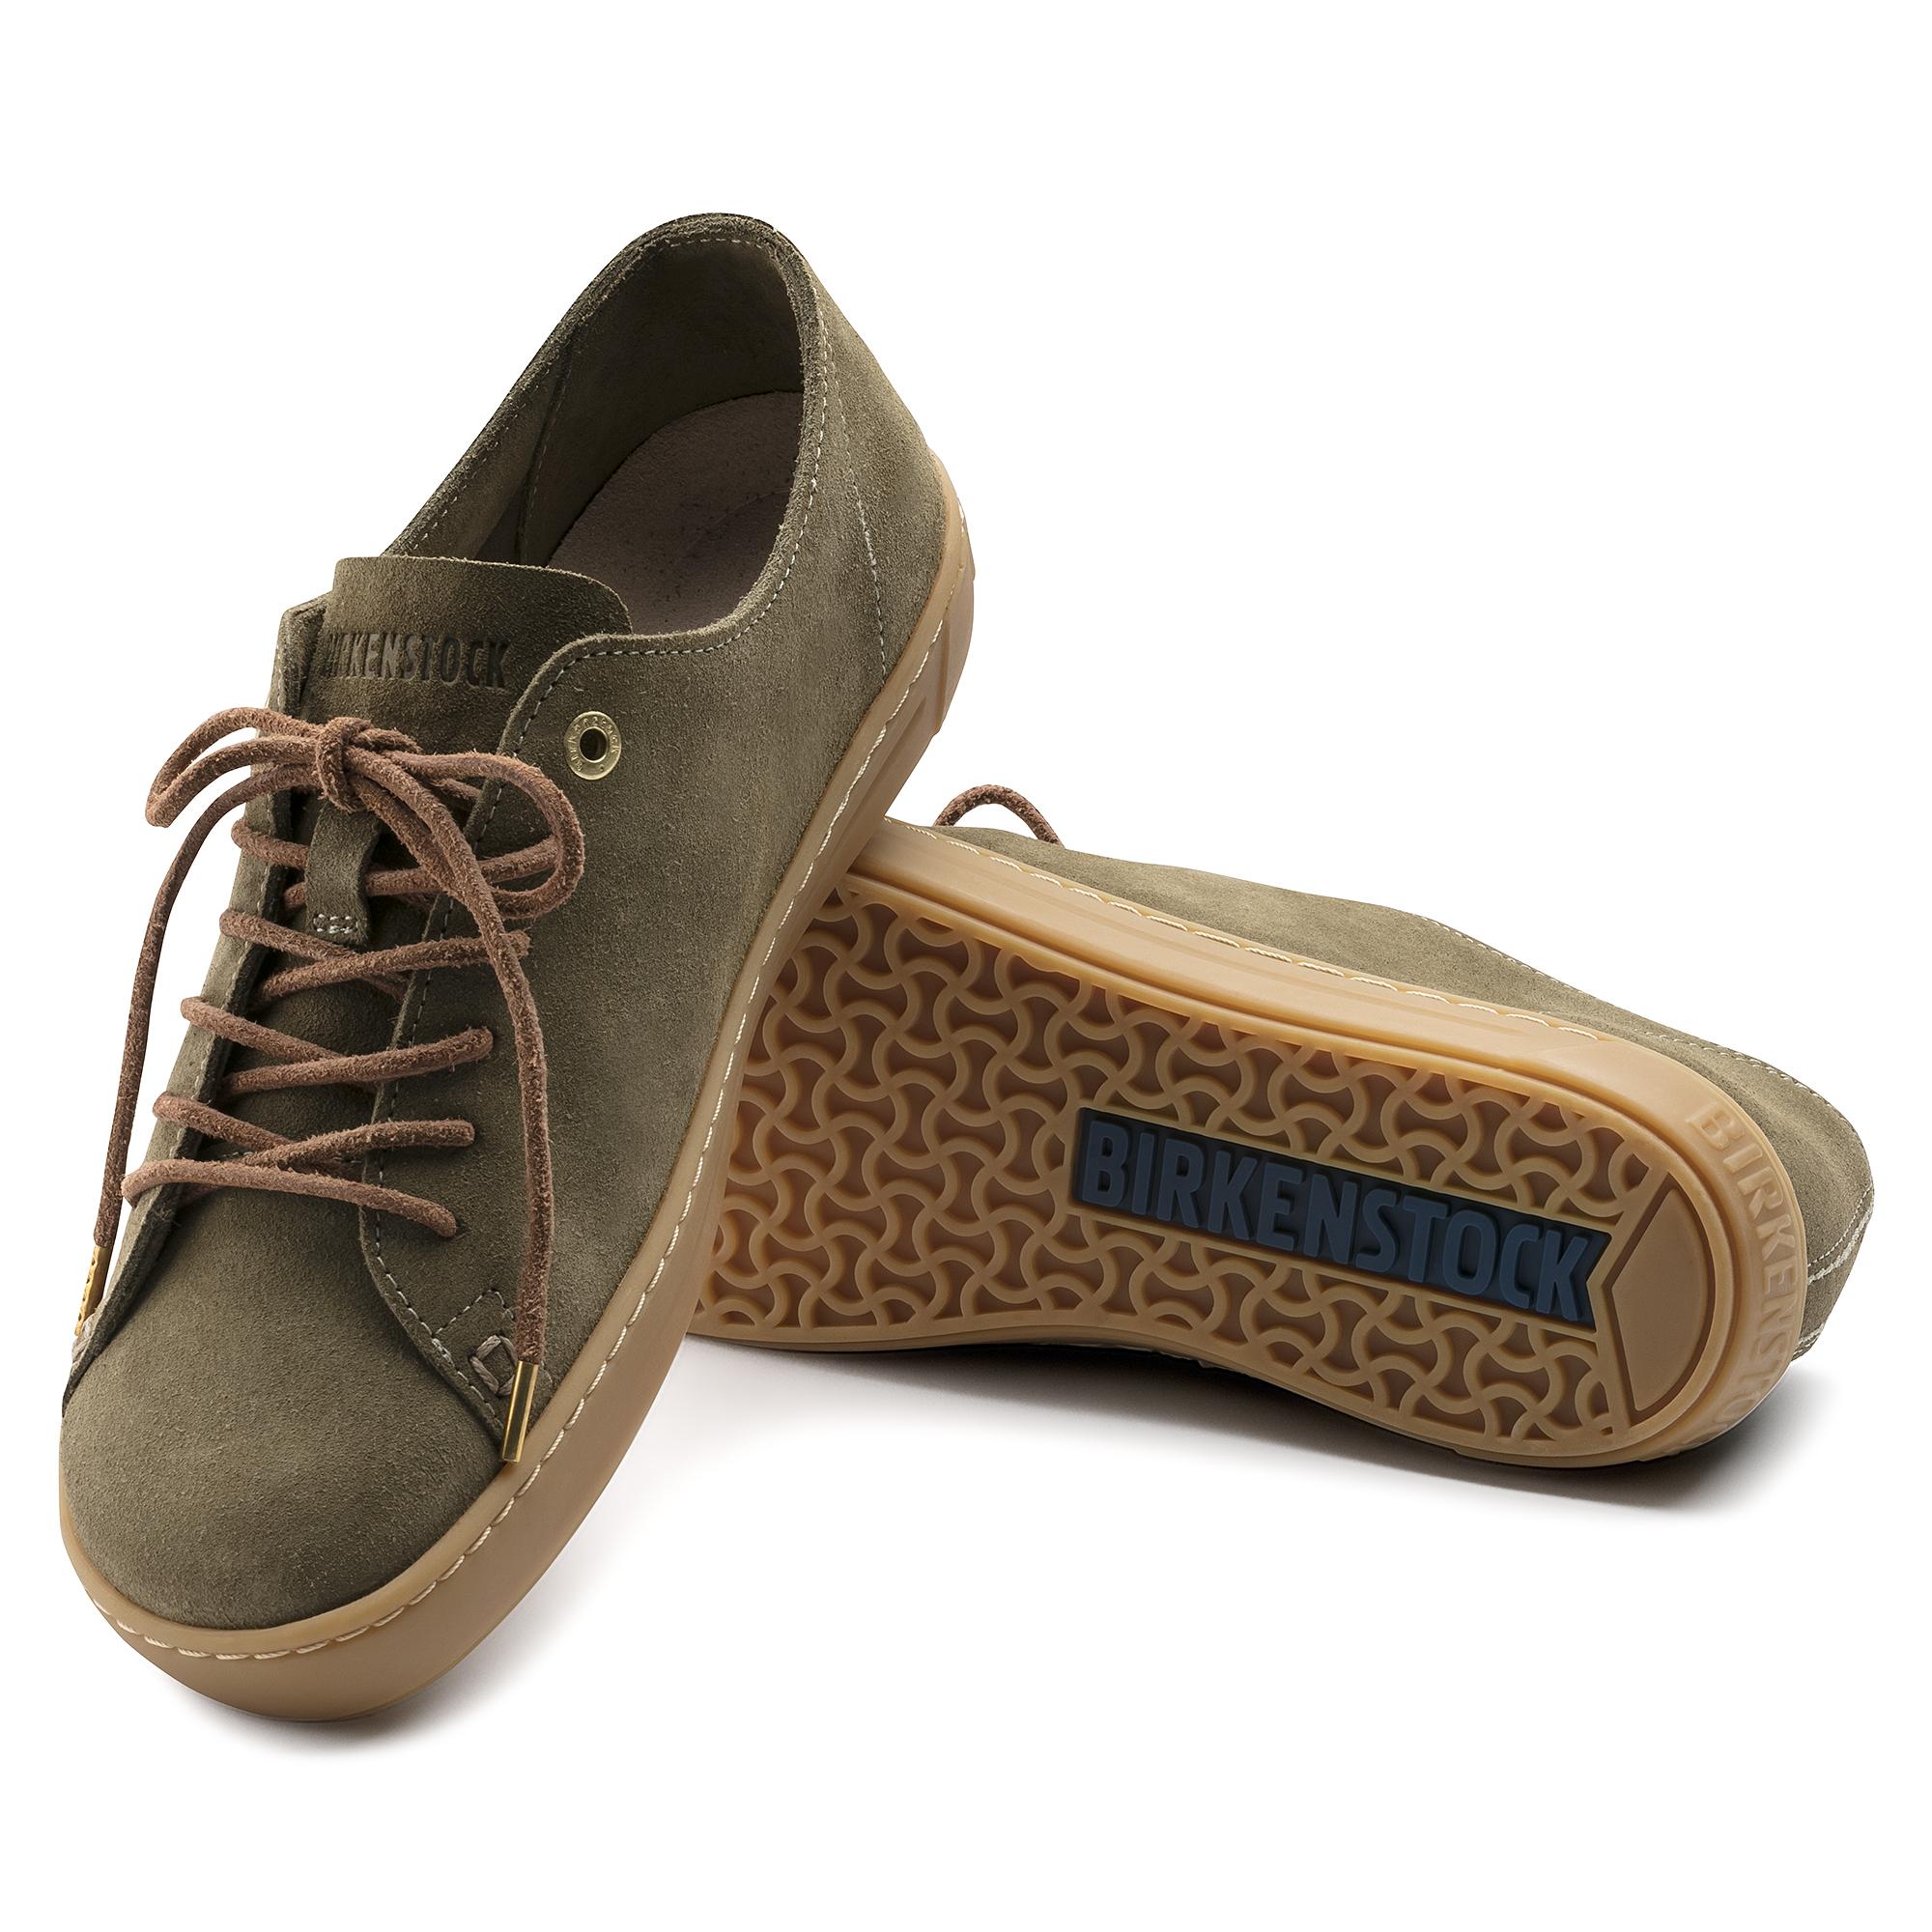 a6c2de3523485 Arran Suede Leather | online kaufen bei BIRKENSTOCK